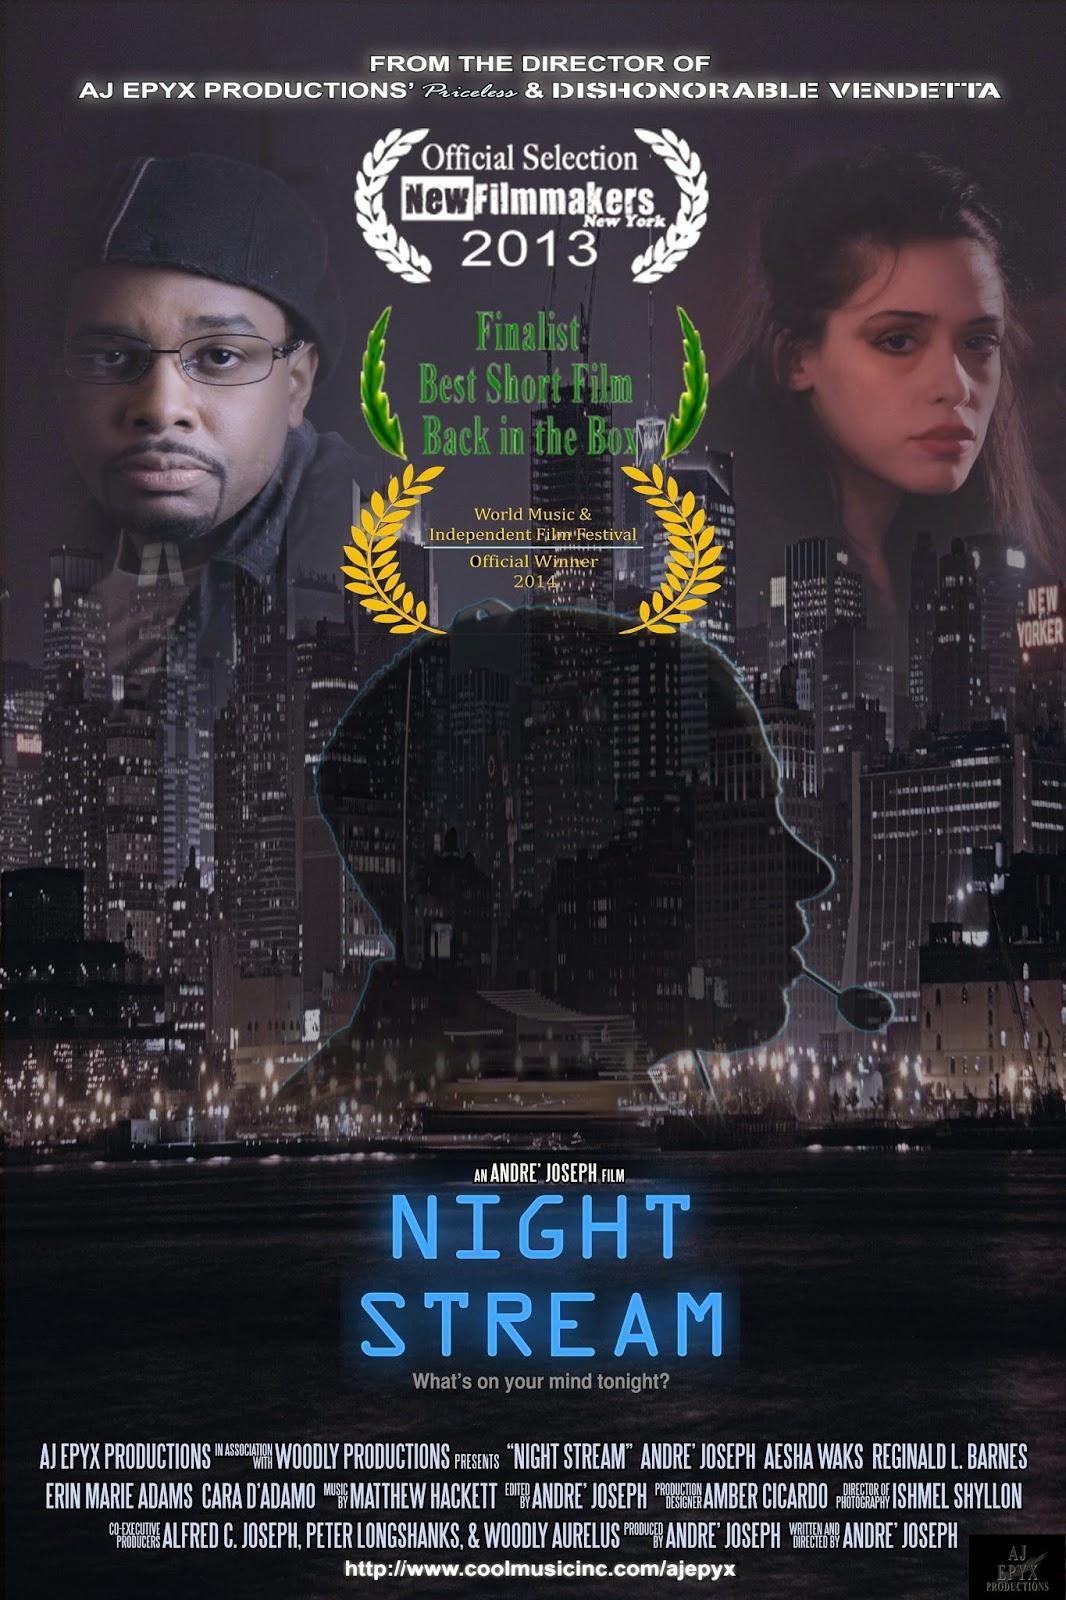 http://www.amazon.com/Night-Stream-Andre-Joseph/dp/B00OBXFHNC/ref=sr_1_1?s=movies-tv&ie=UTF8&qid=1412953694&sr=1-1&keywords=Night+Stream